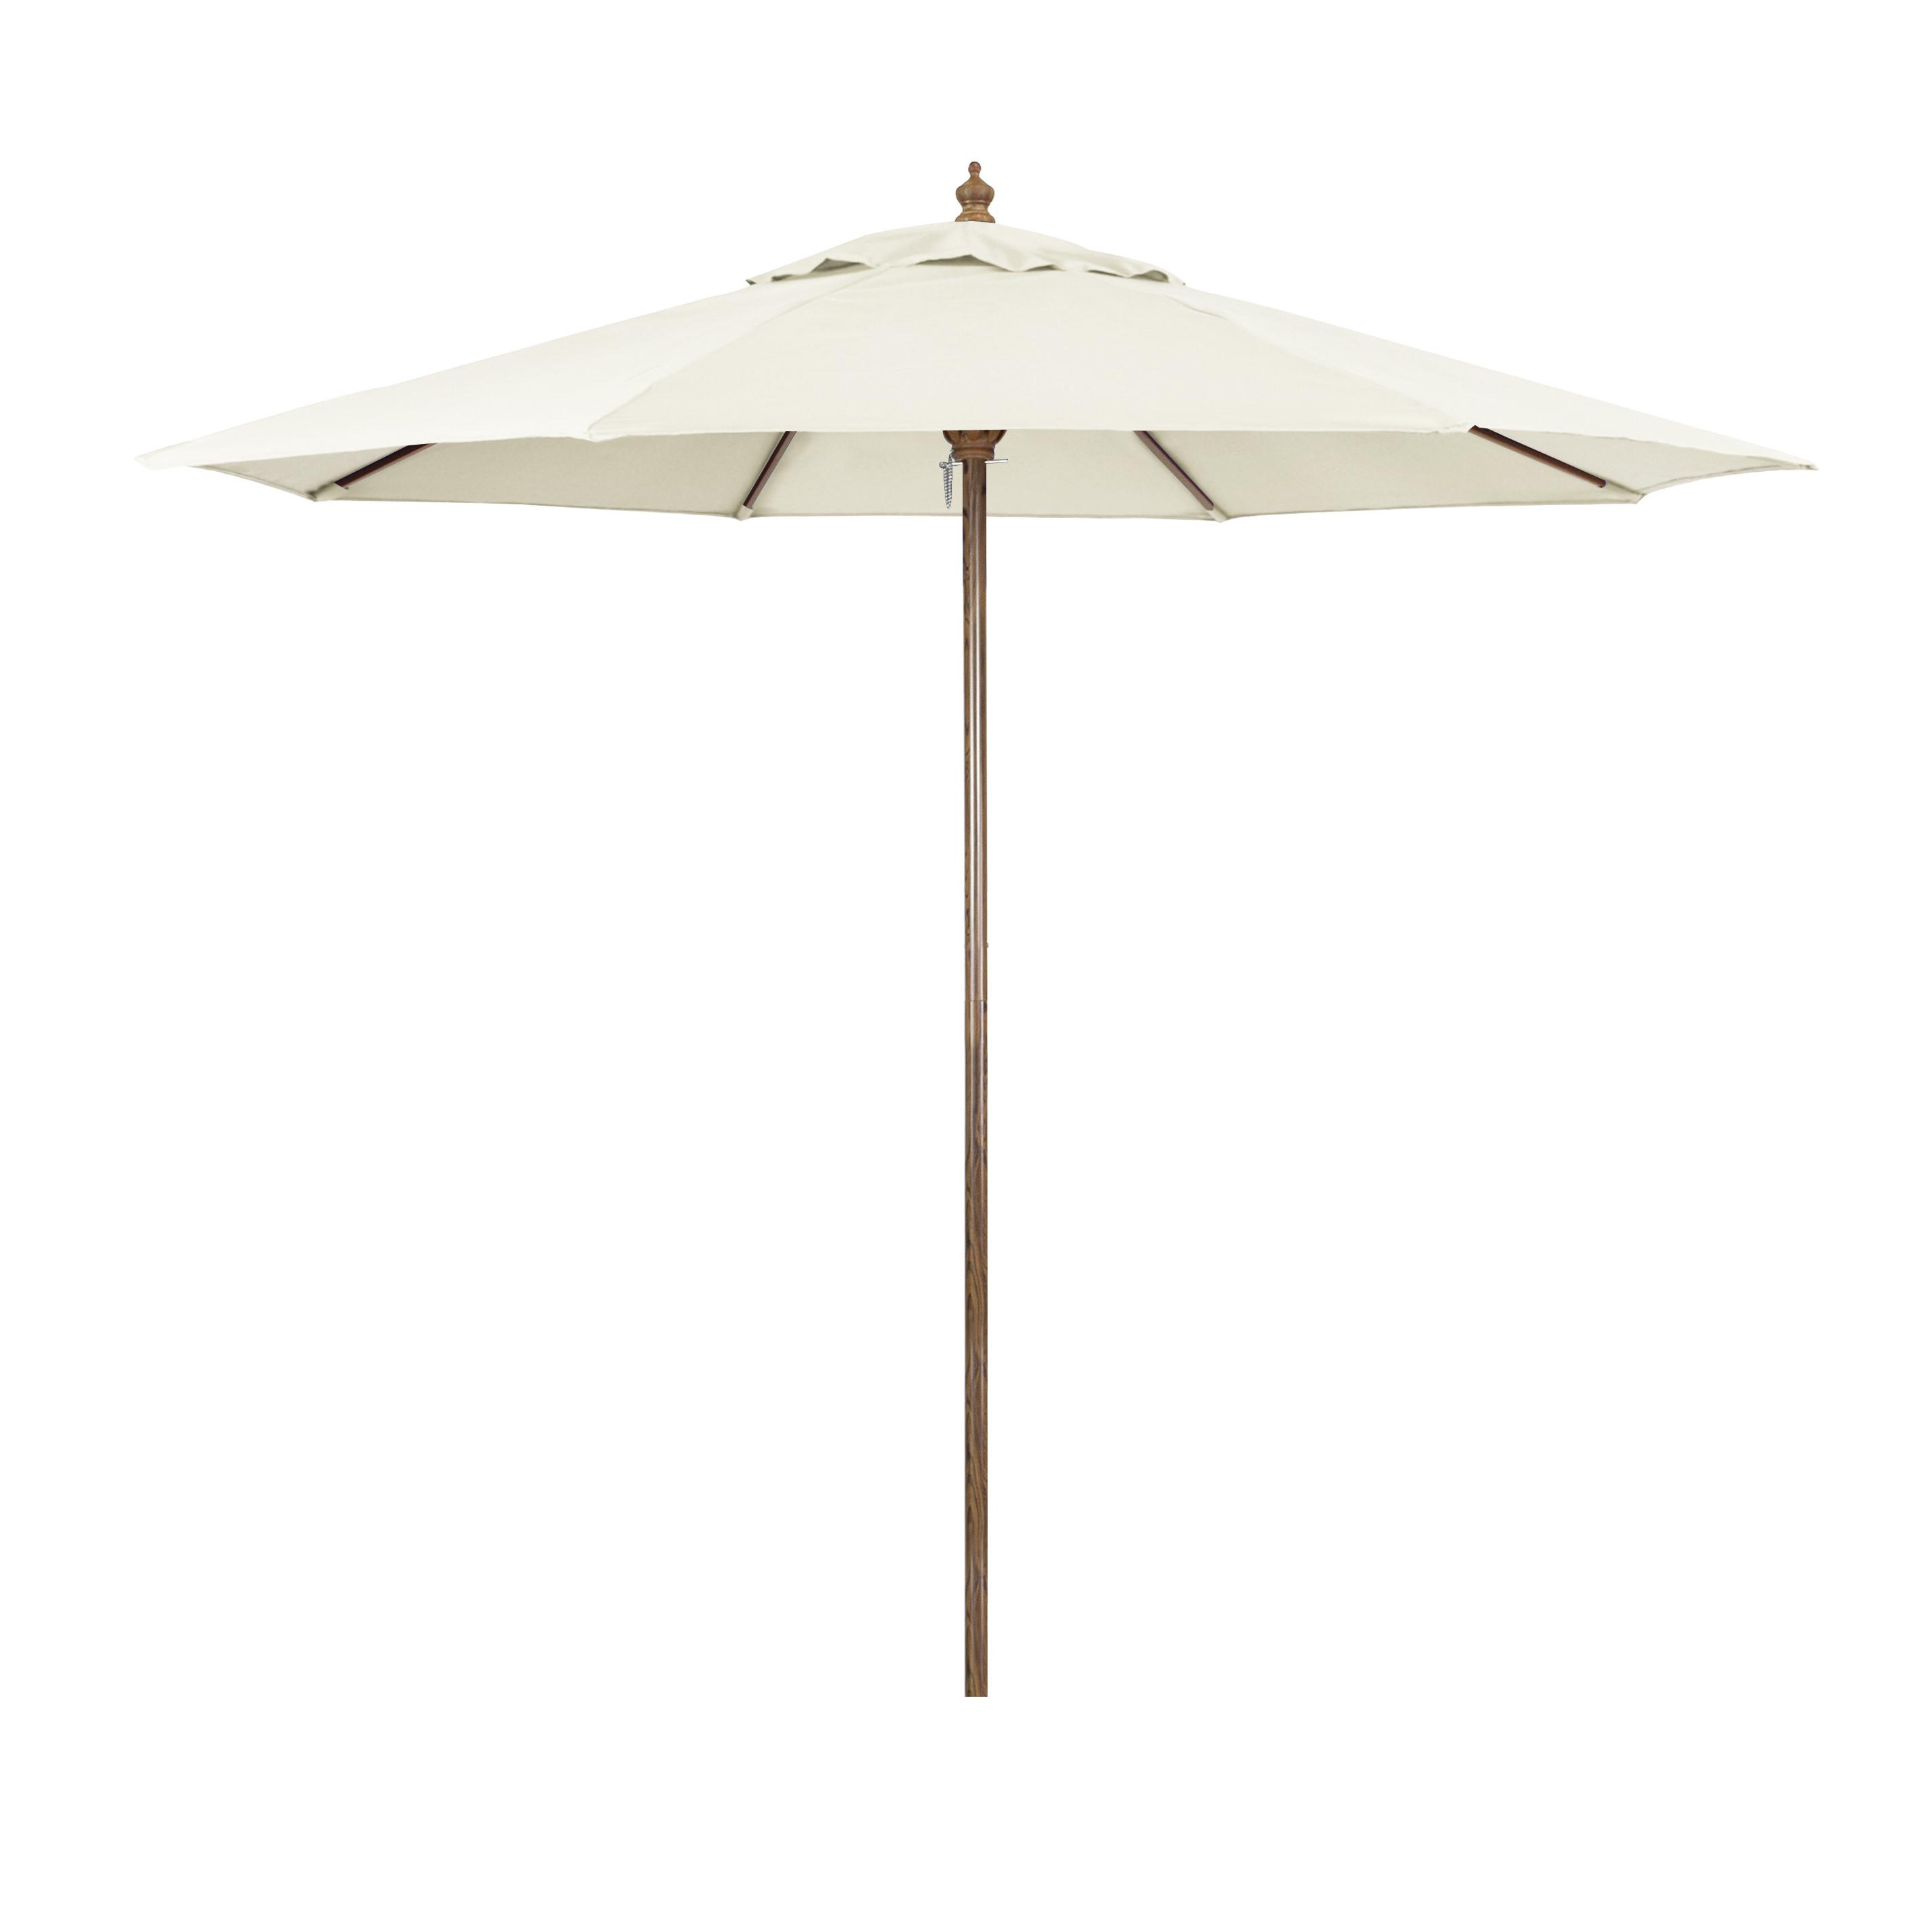 Jericho Market Umbrellas For Current Ryant 9' Market Umbrella (View 13 of 20)